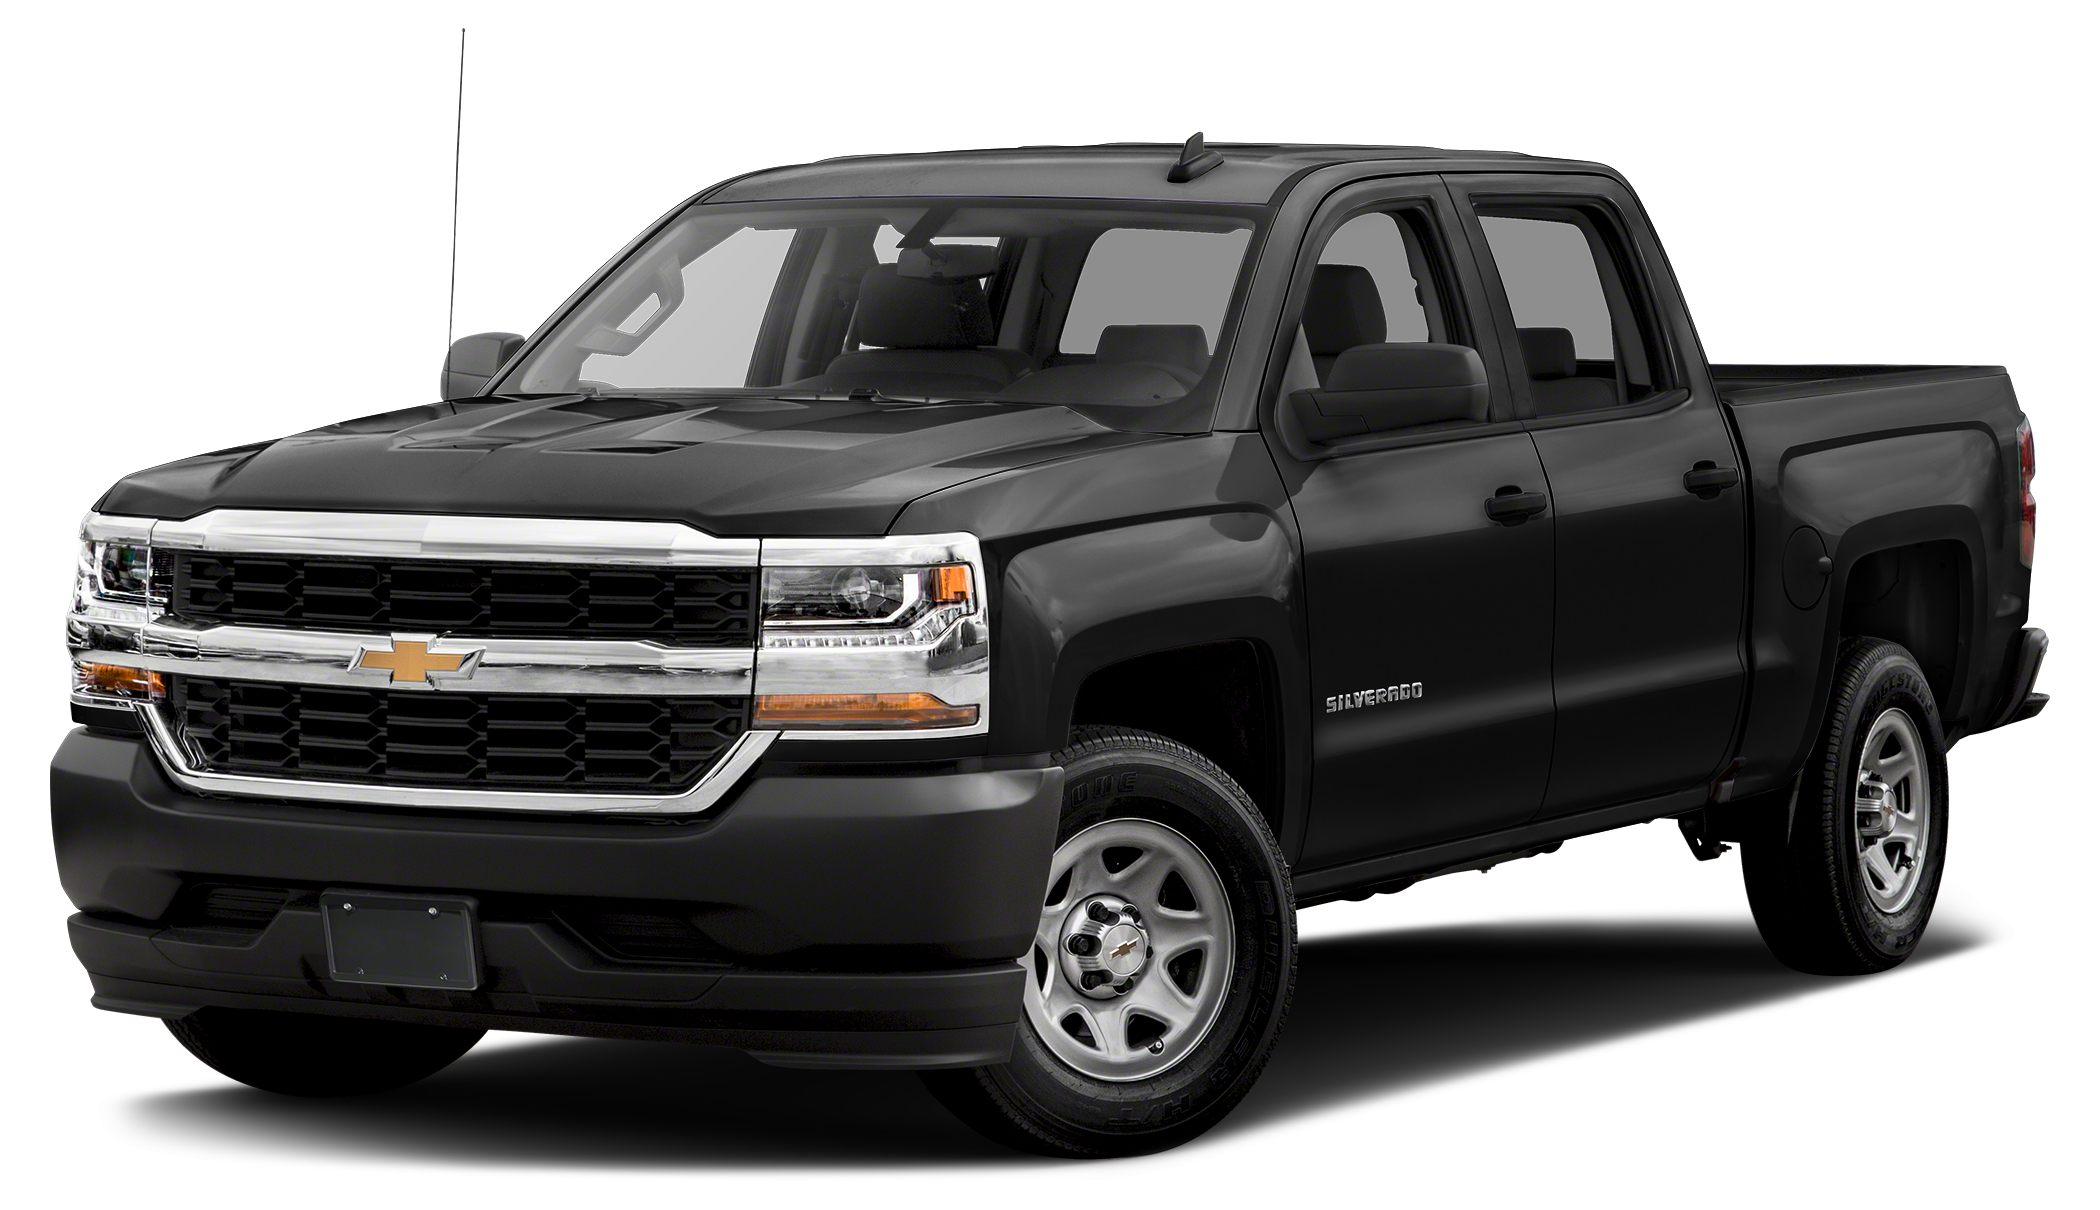 2017 Chevrolet Silverado 1500 WT BLACK exterior and JET BLACK  DARK ASH interior Work Truck trim